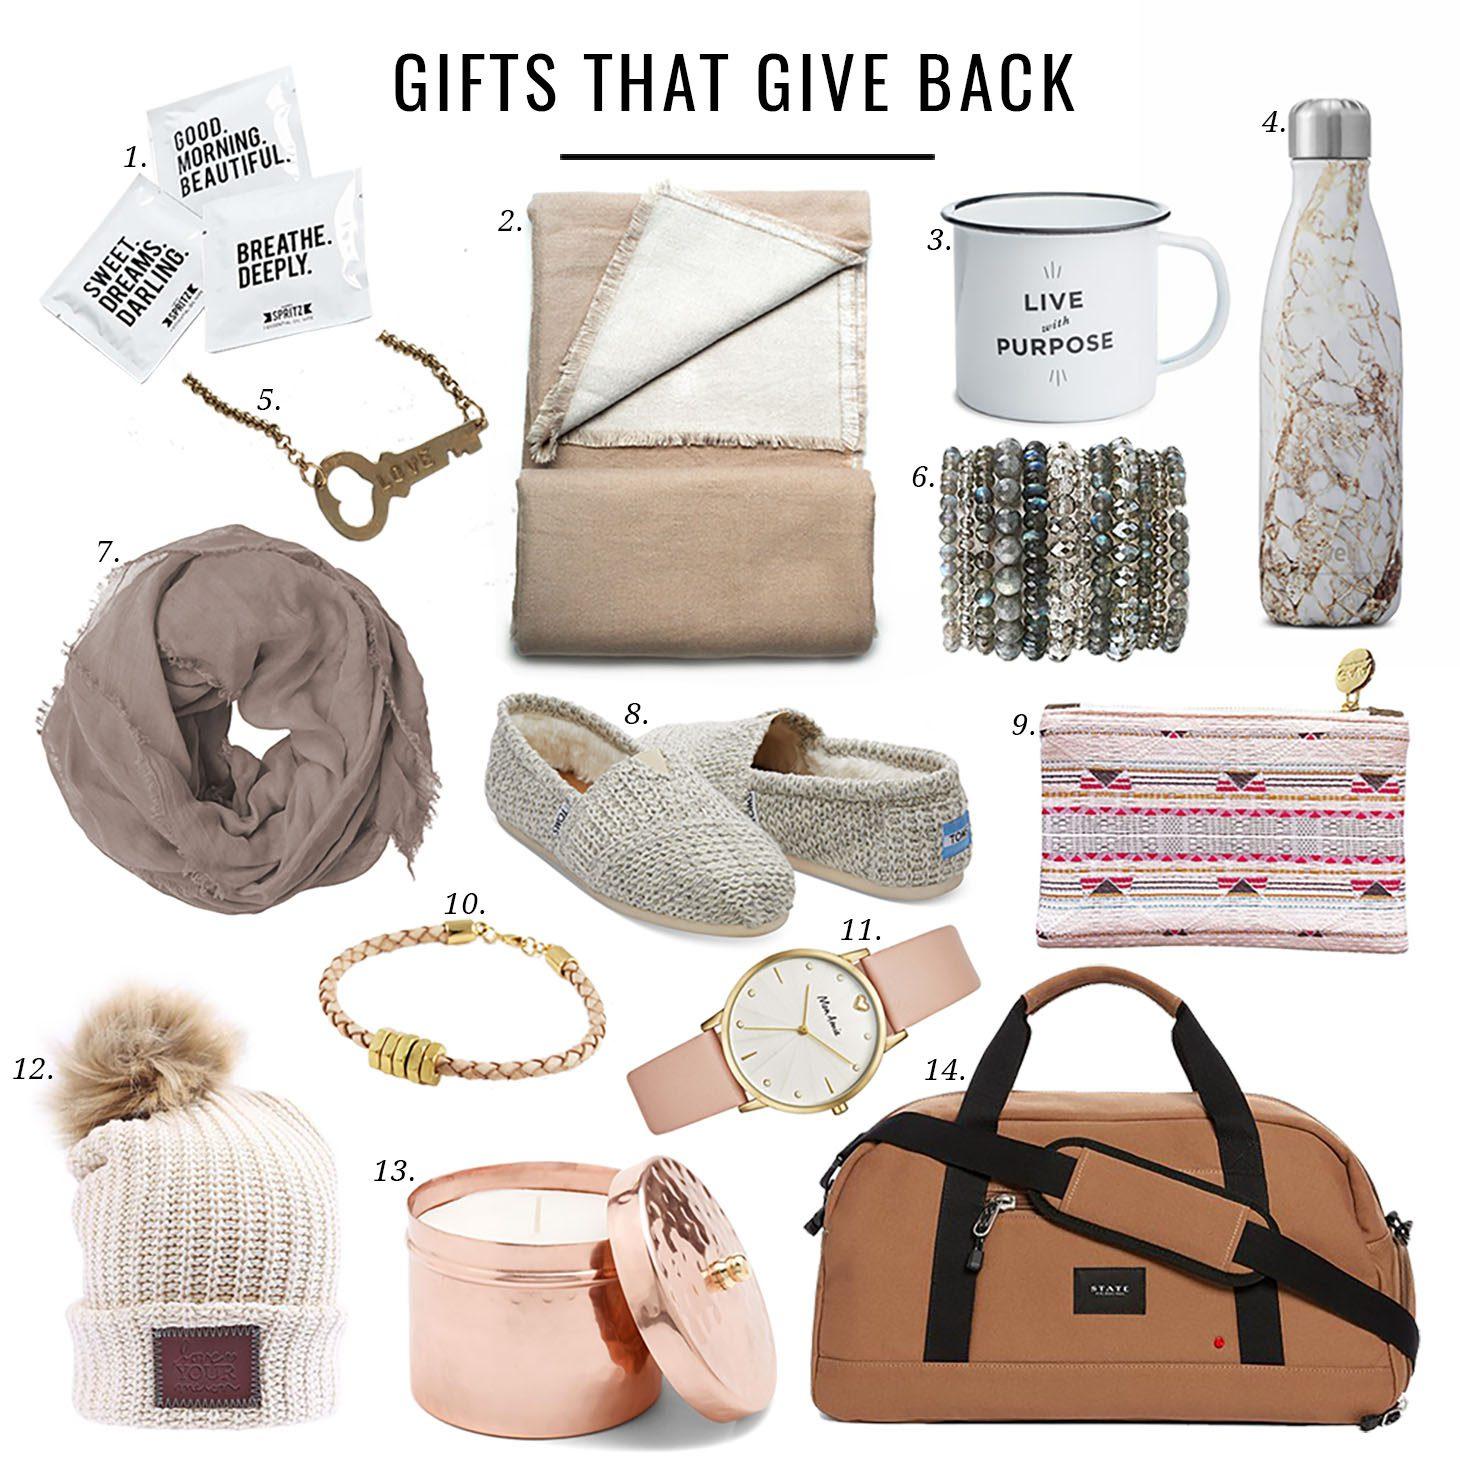 Jillian Harris Gifts that Give Back Gift Guide